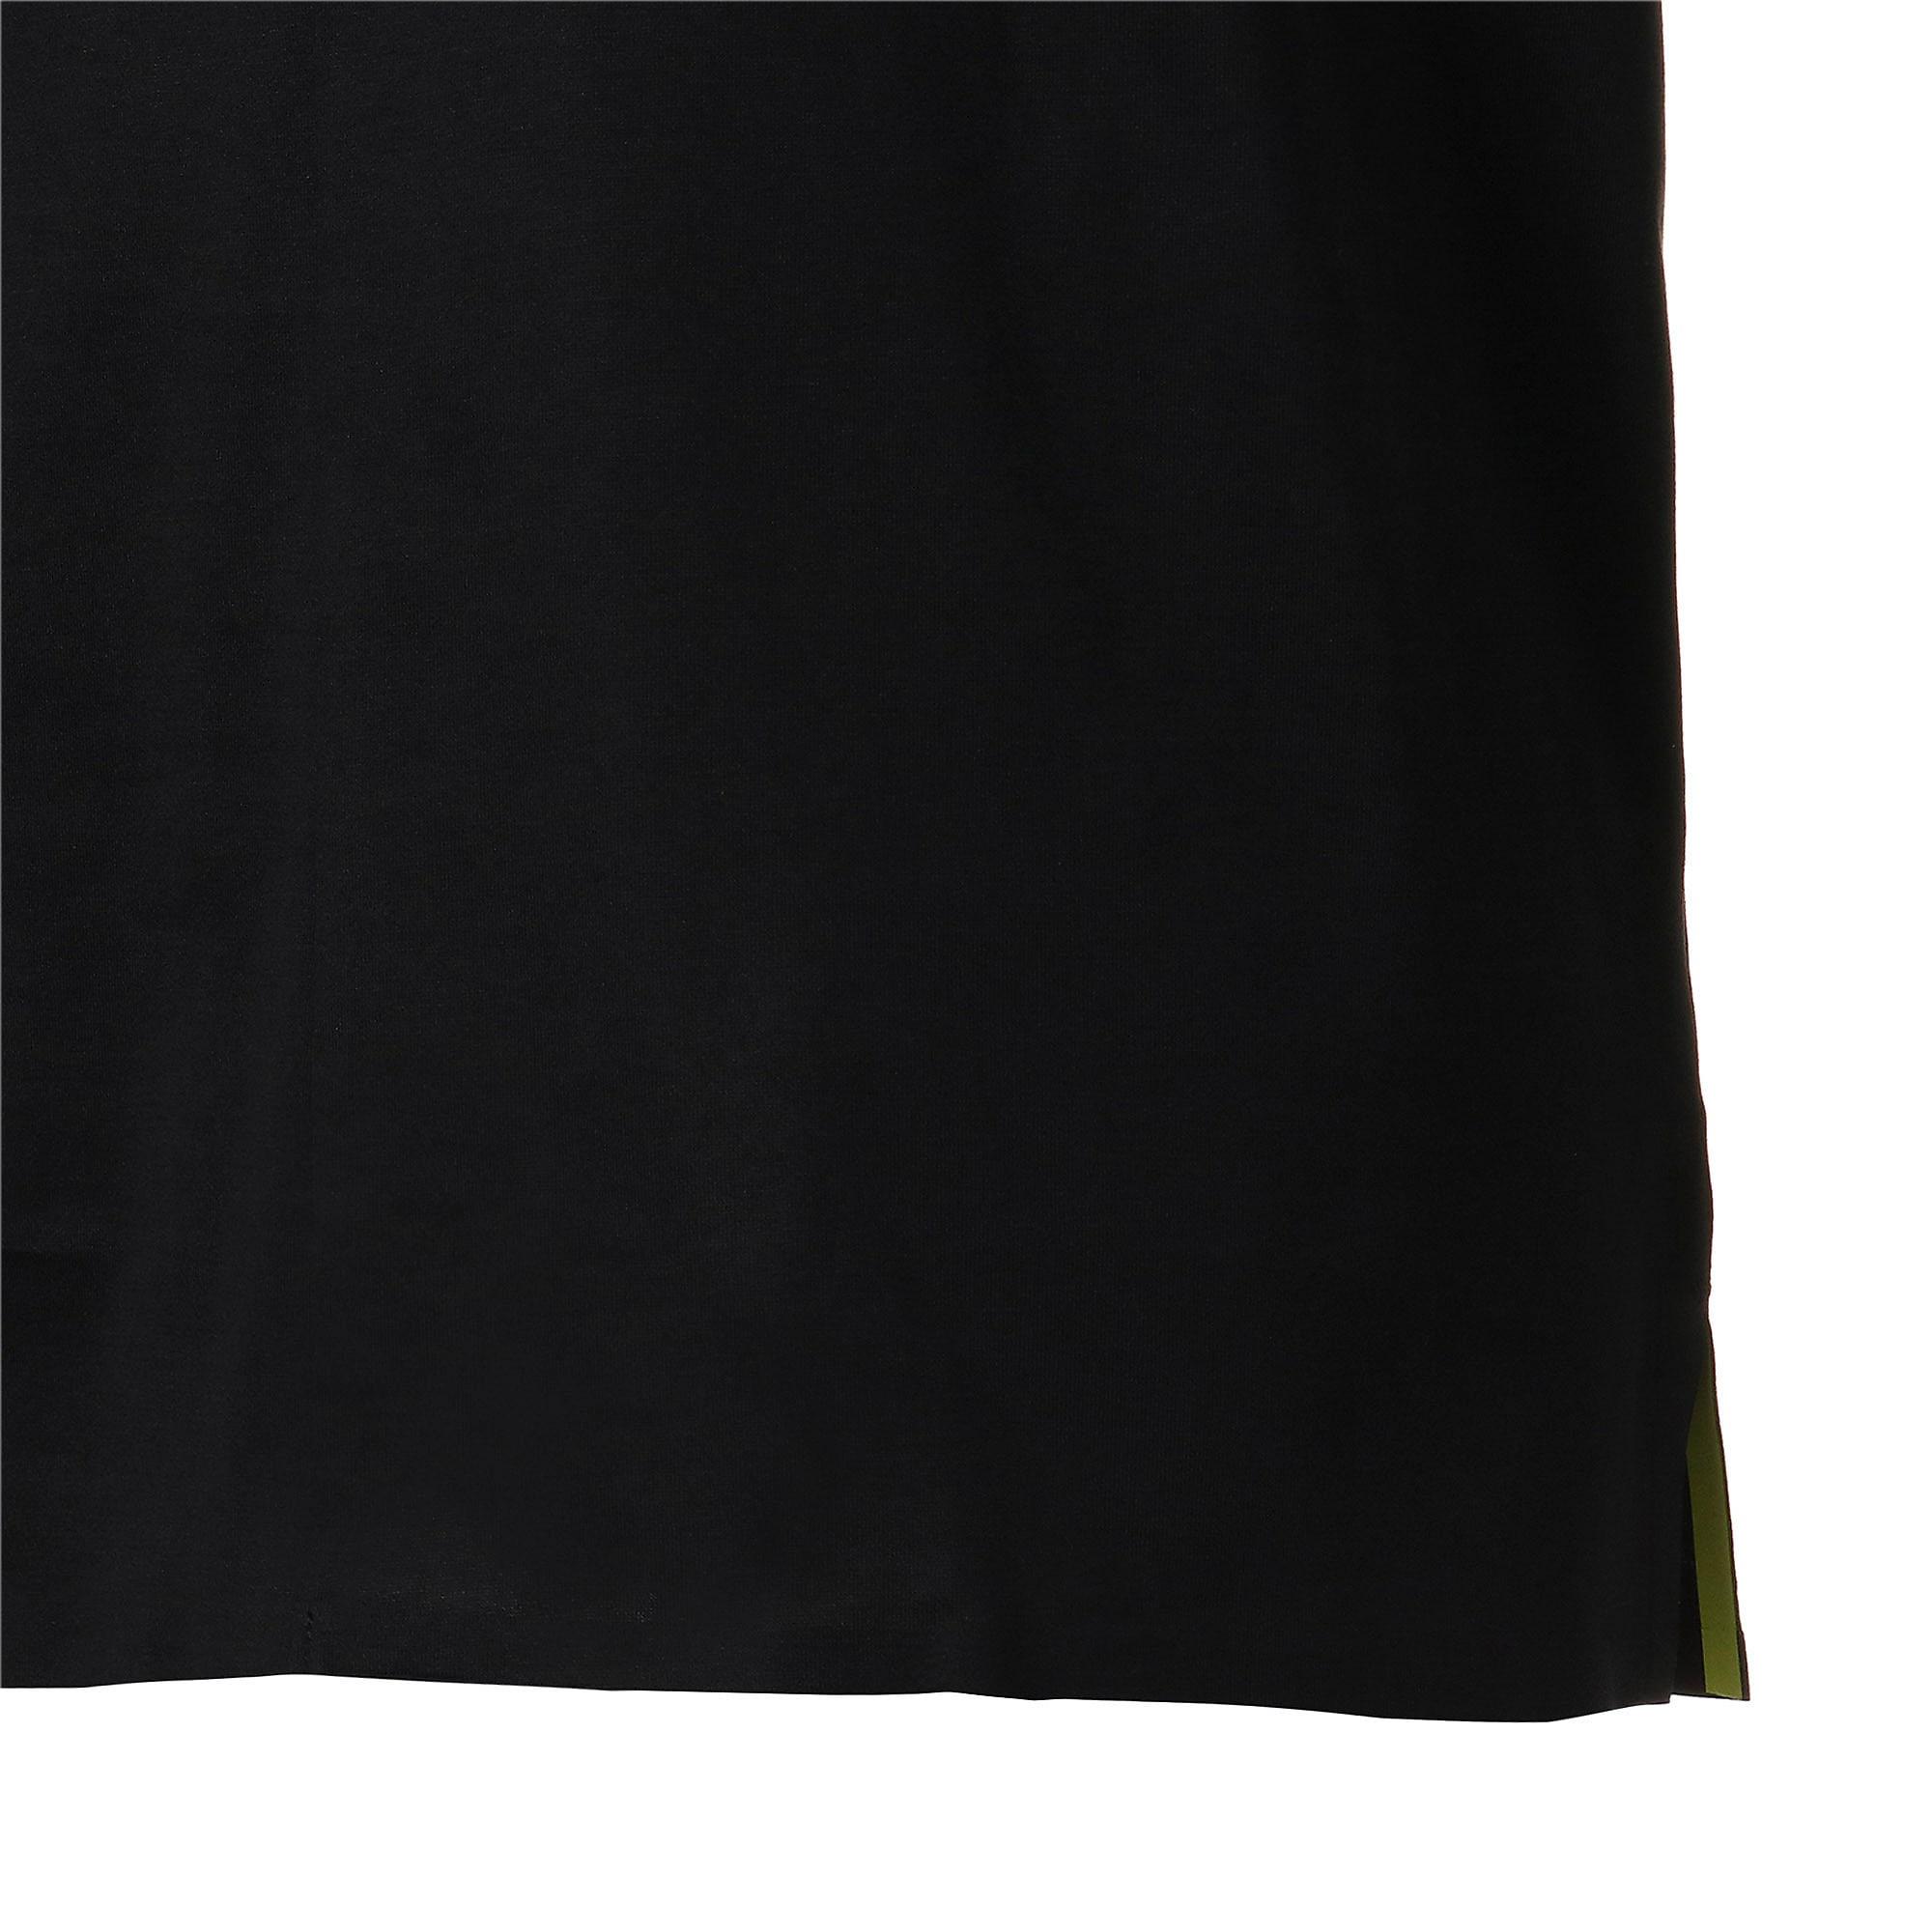 Thumbnail 6 of M ポルシェデザイン PD グラフィック Tシャツ, Jet Black, medium-JPN